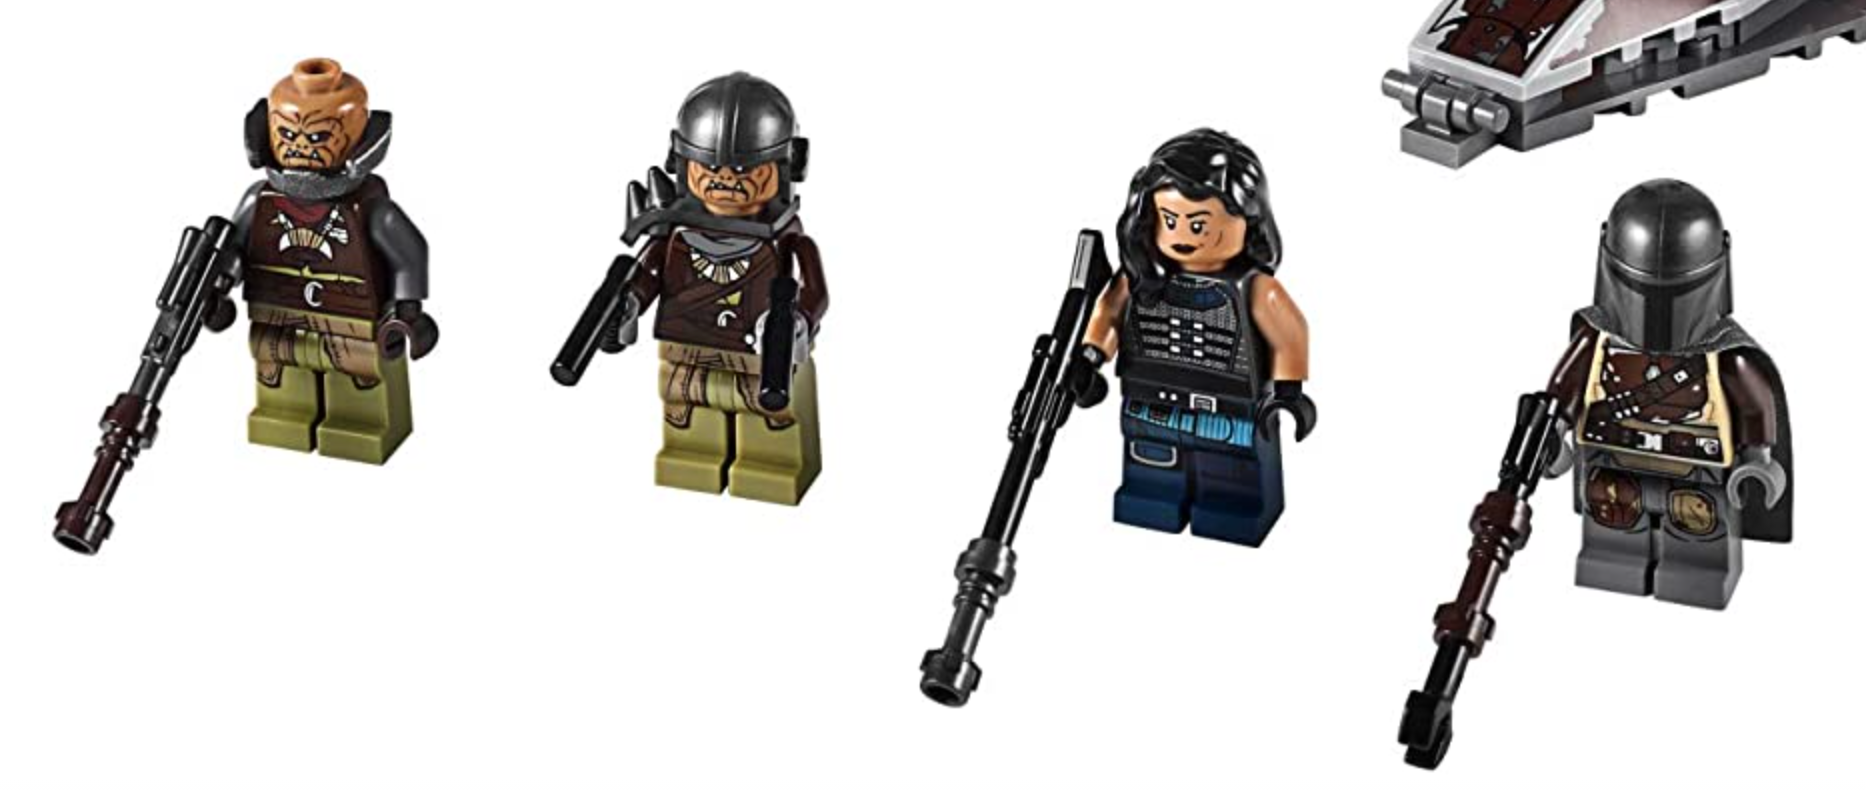 LEGO 75254 Minifigures